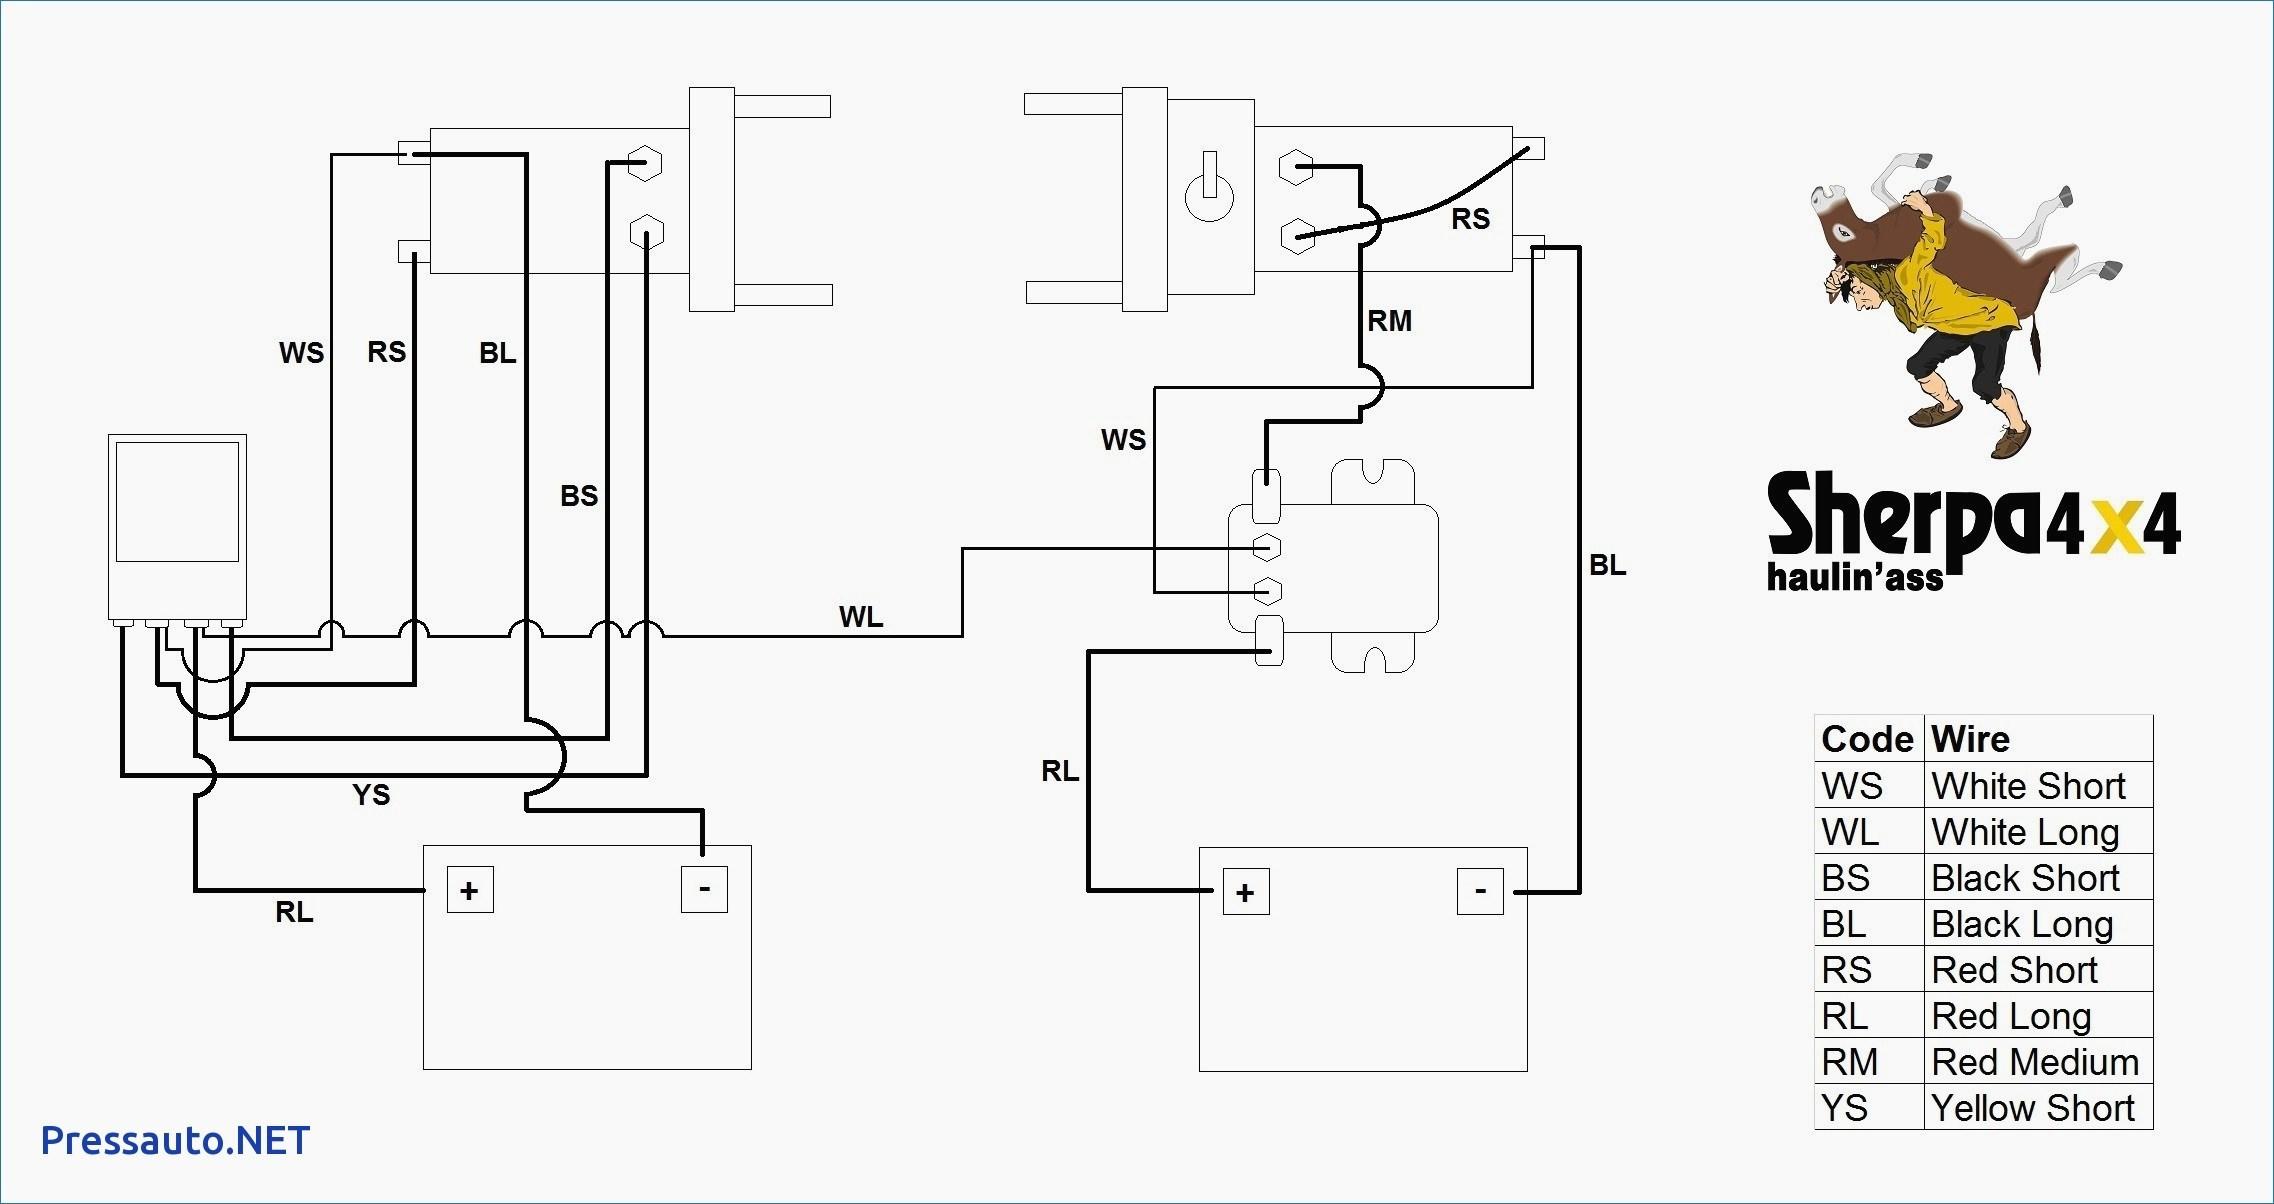 DIAGRAM] Mile Marker Winch Solenoid Wiring Diagram Full HD version -  DODGECITYENT.MSC-LAUSITZRING.DE | Hydramax 640k26 Pool Pump Wiring Diagram |  | dodgecityent msc-lausitzring de